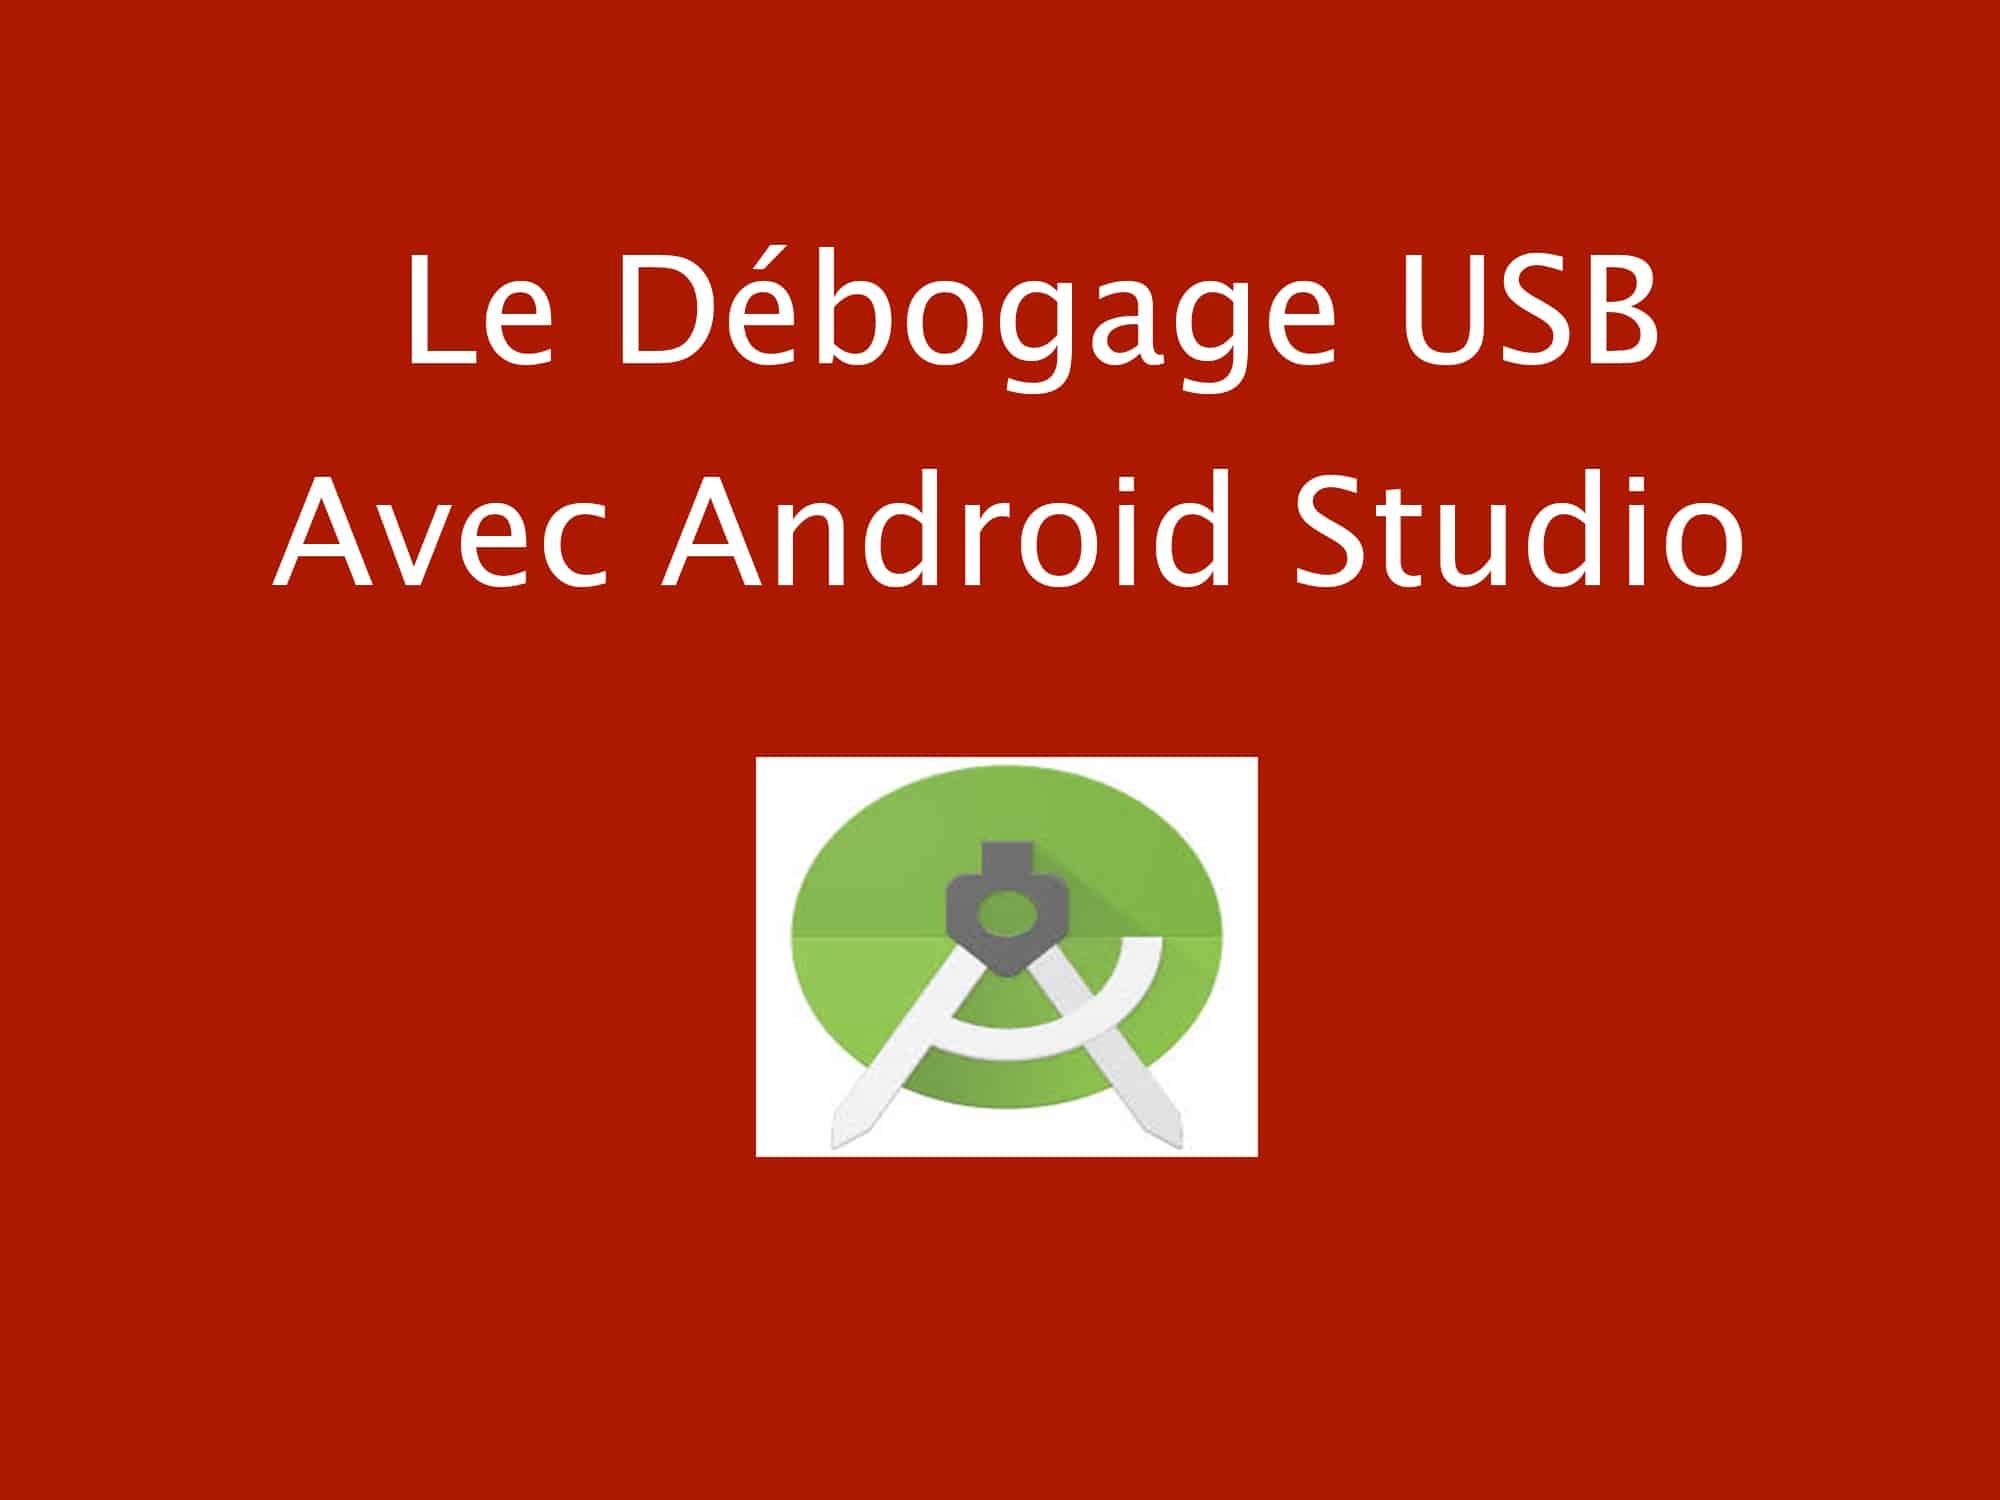 debogage usb avec android studio